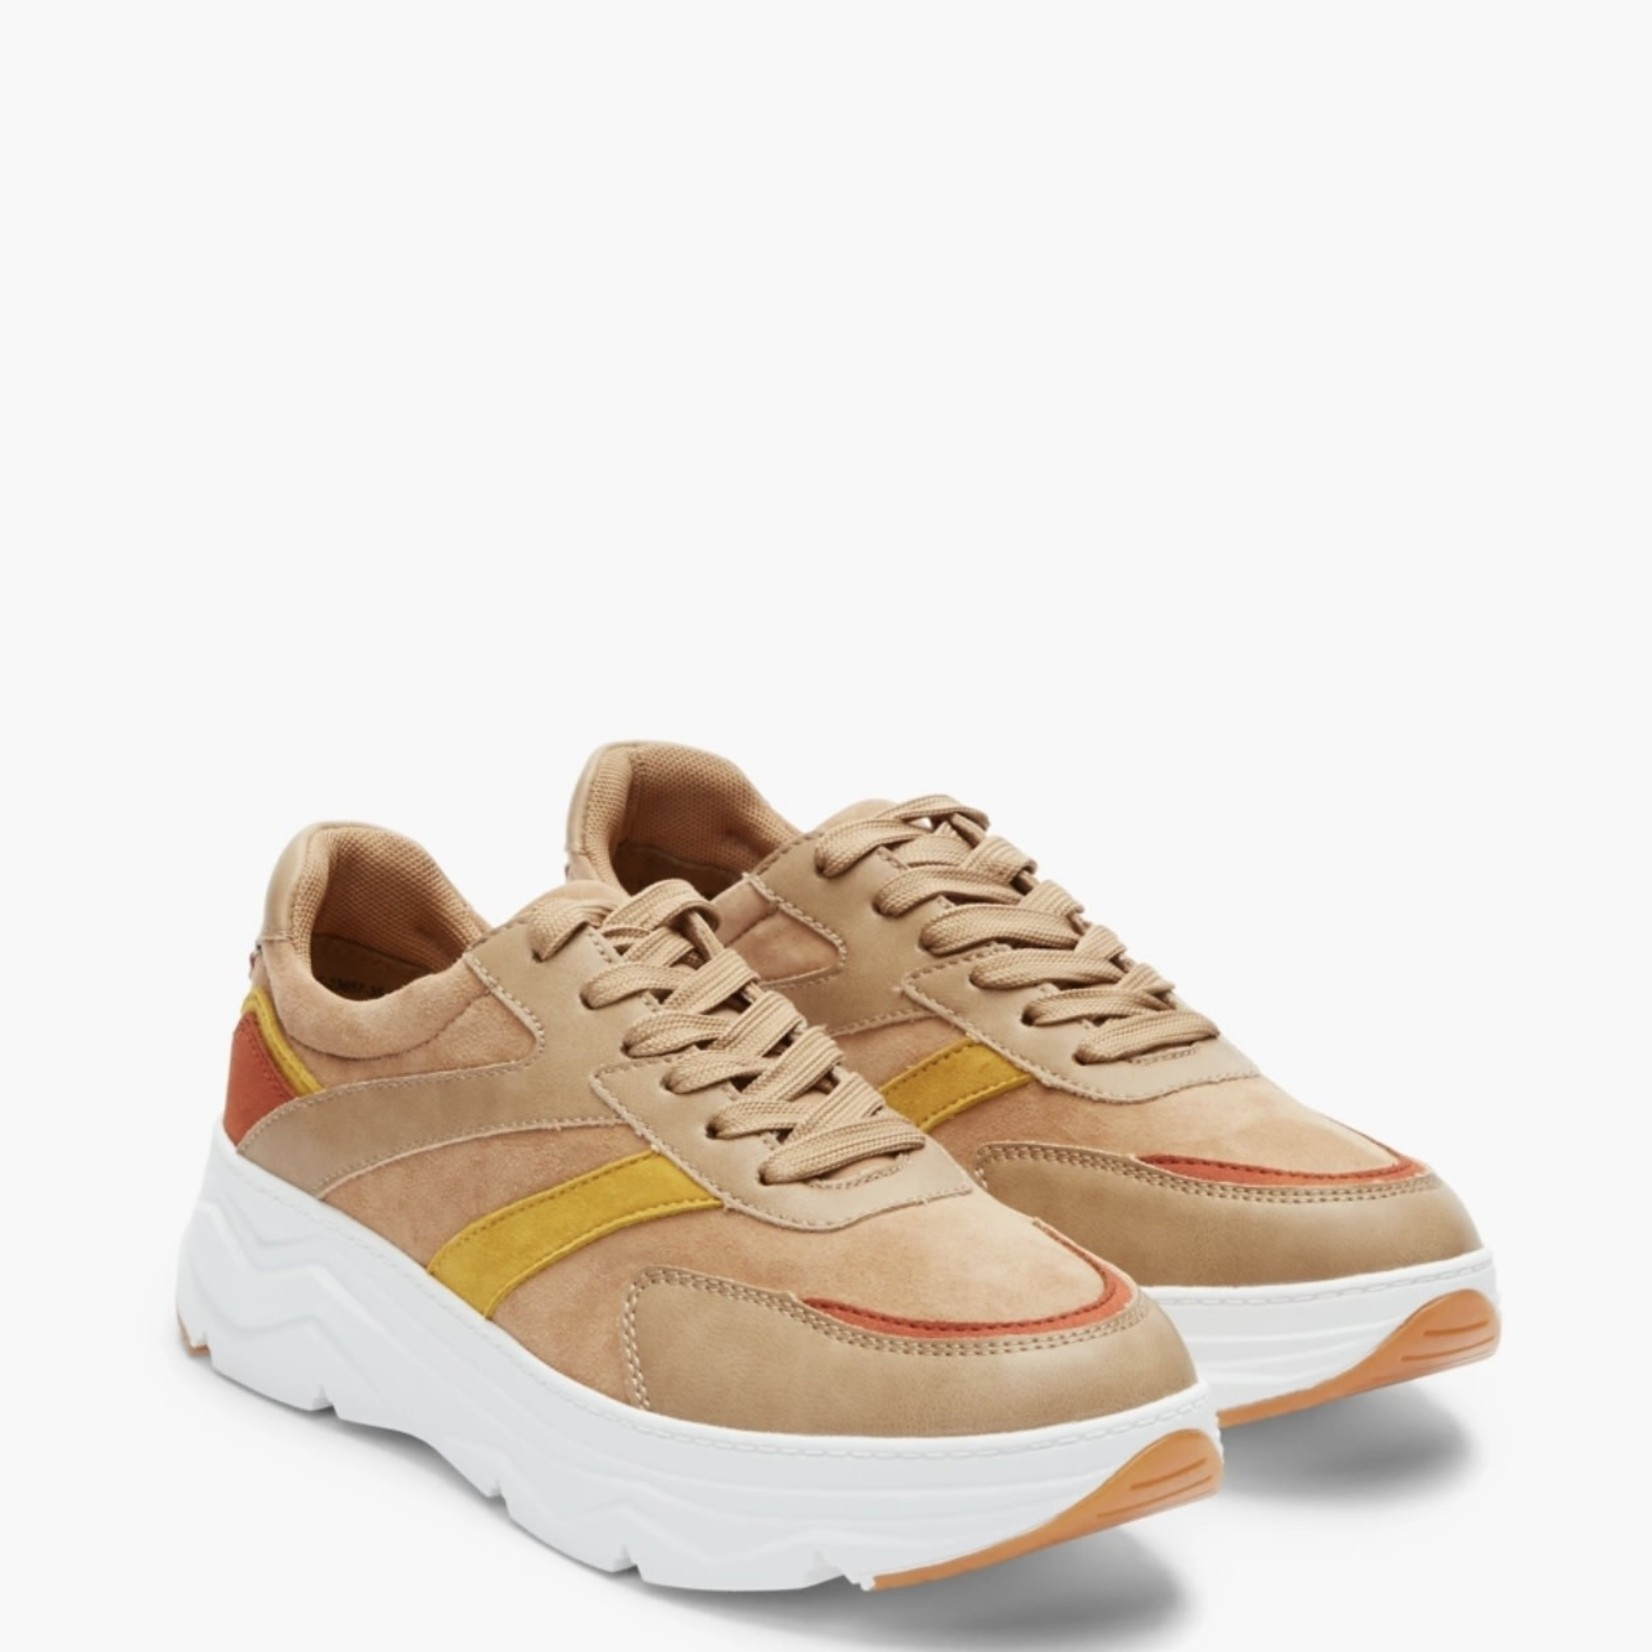 S.Oliver Sneaker Sand